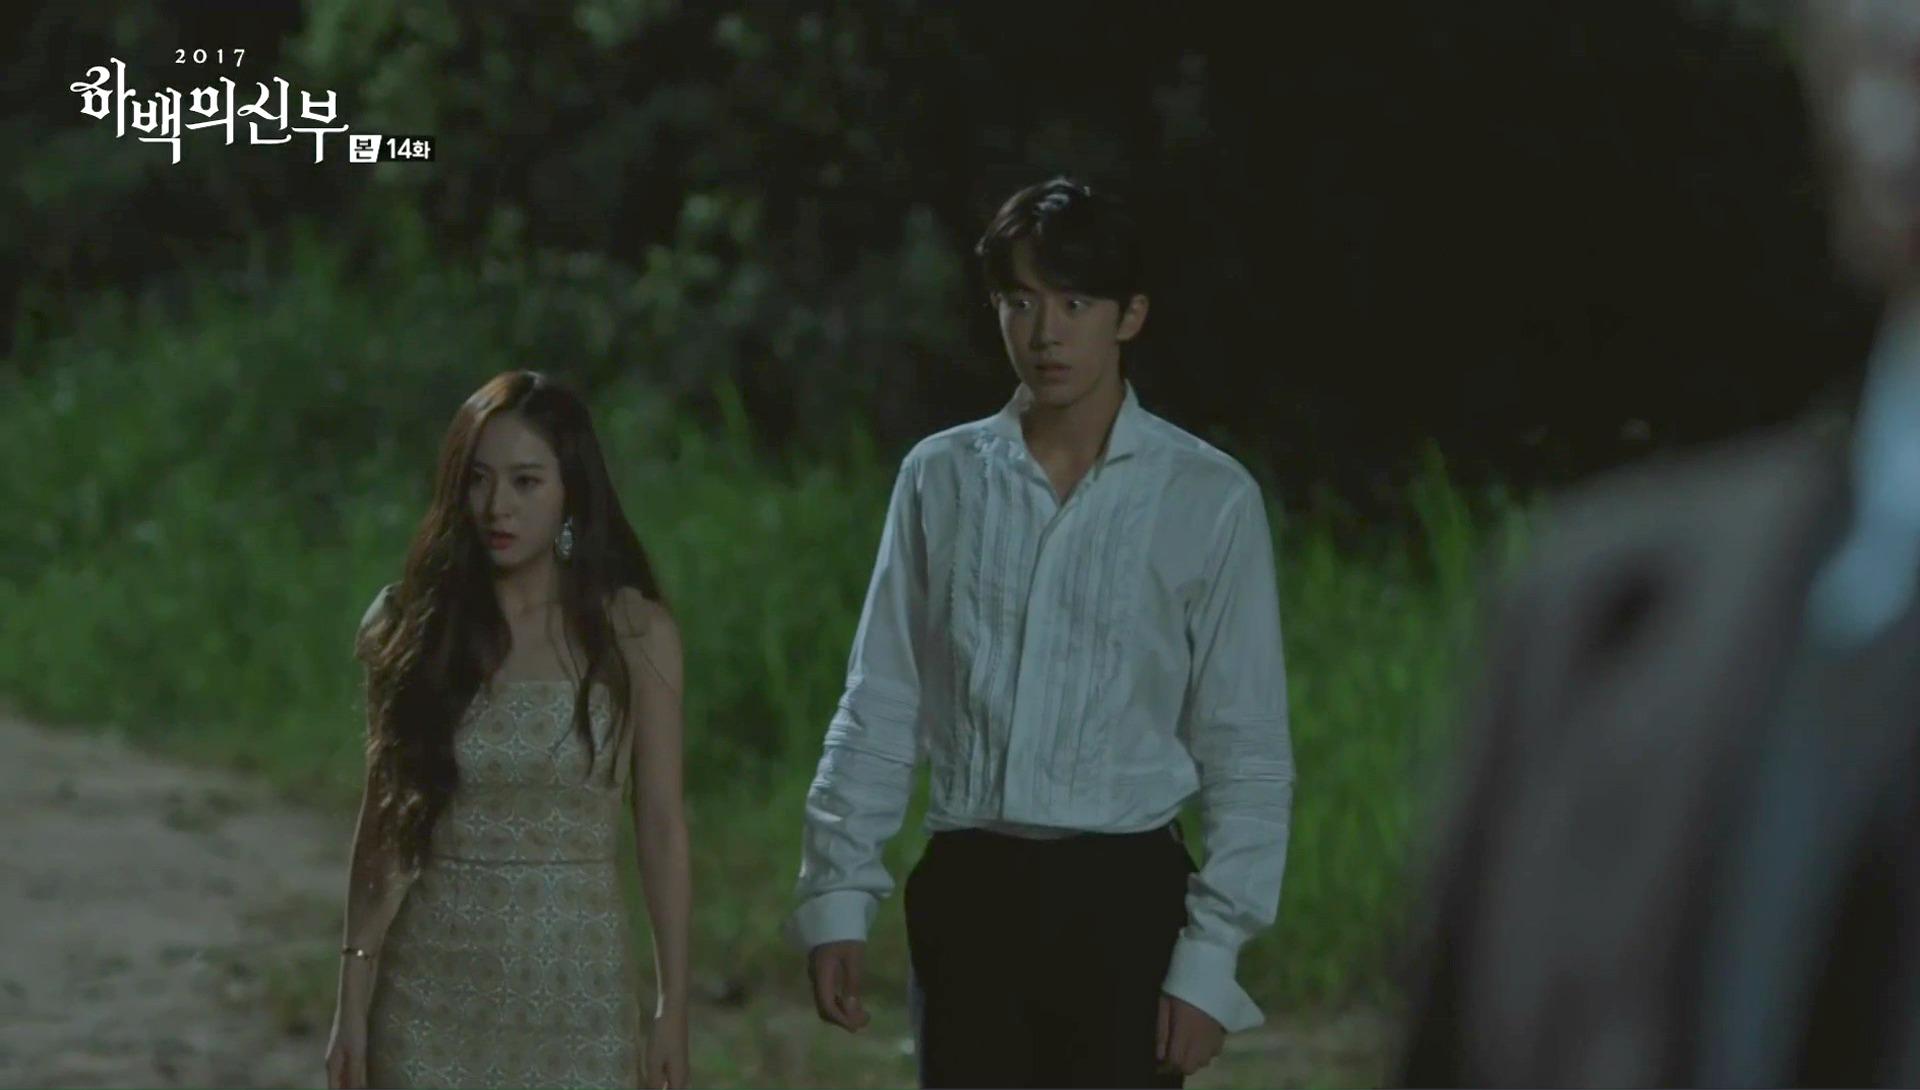 Bride Of The Water God 2017 Episode 14 Dramabeans Korean Drama Recaps